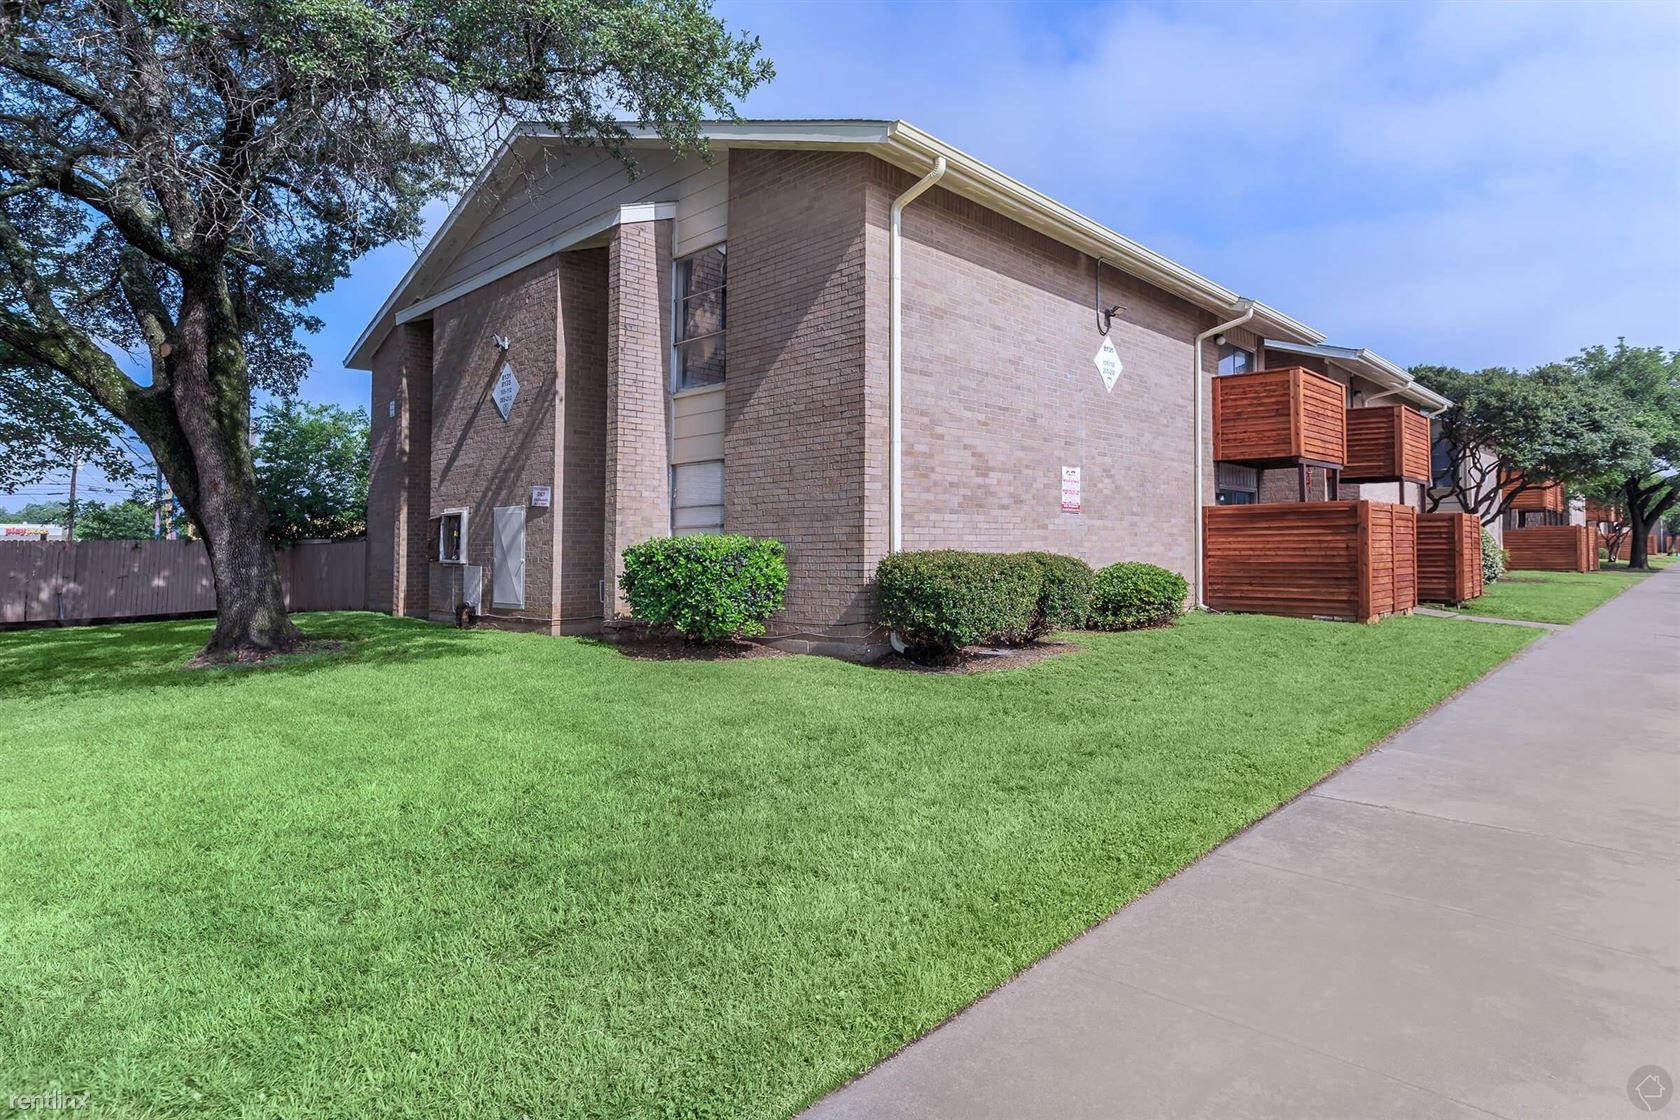 8157 Barclay St, Dallas, TX - $774 USD/ month